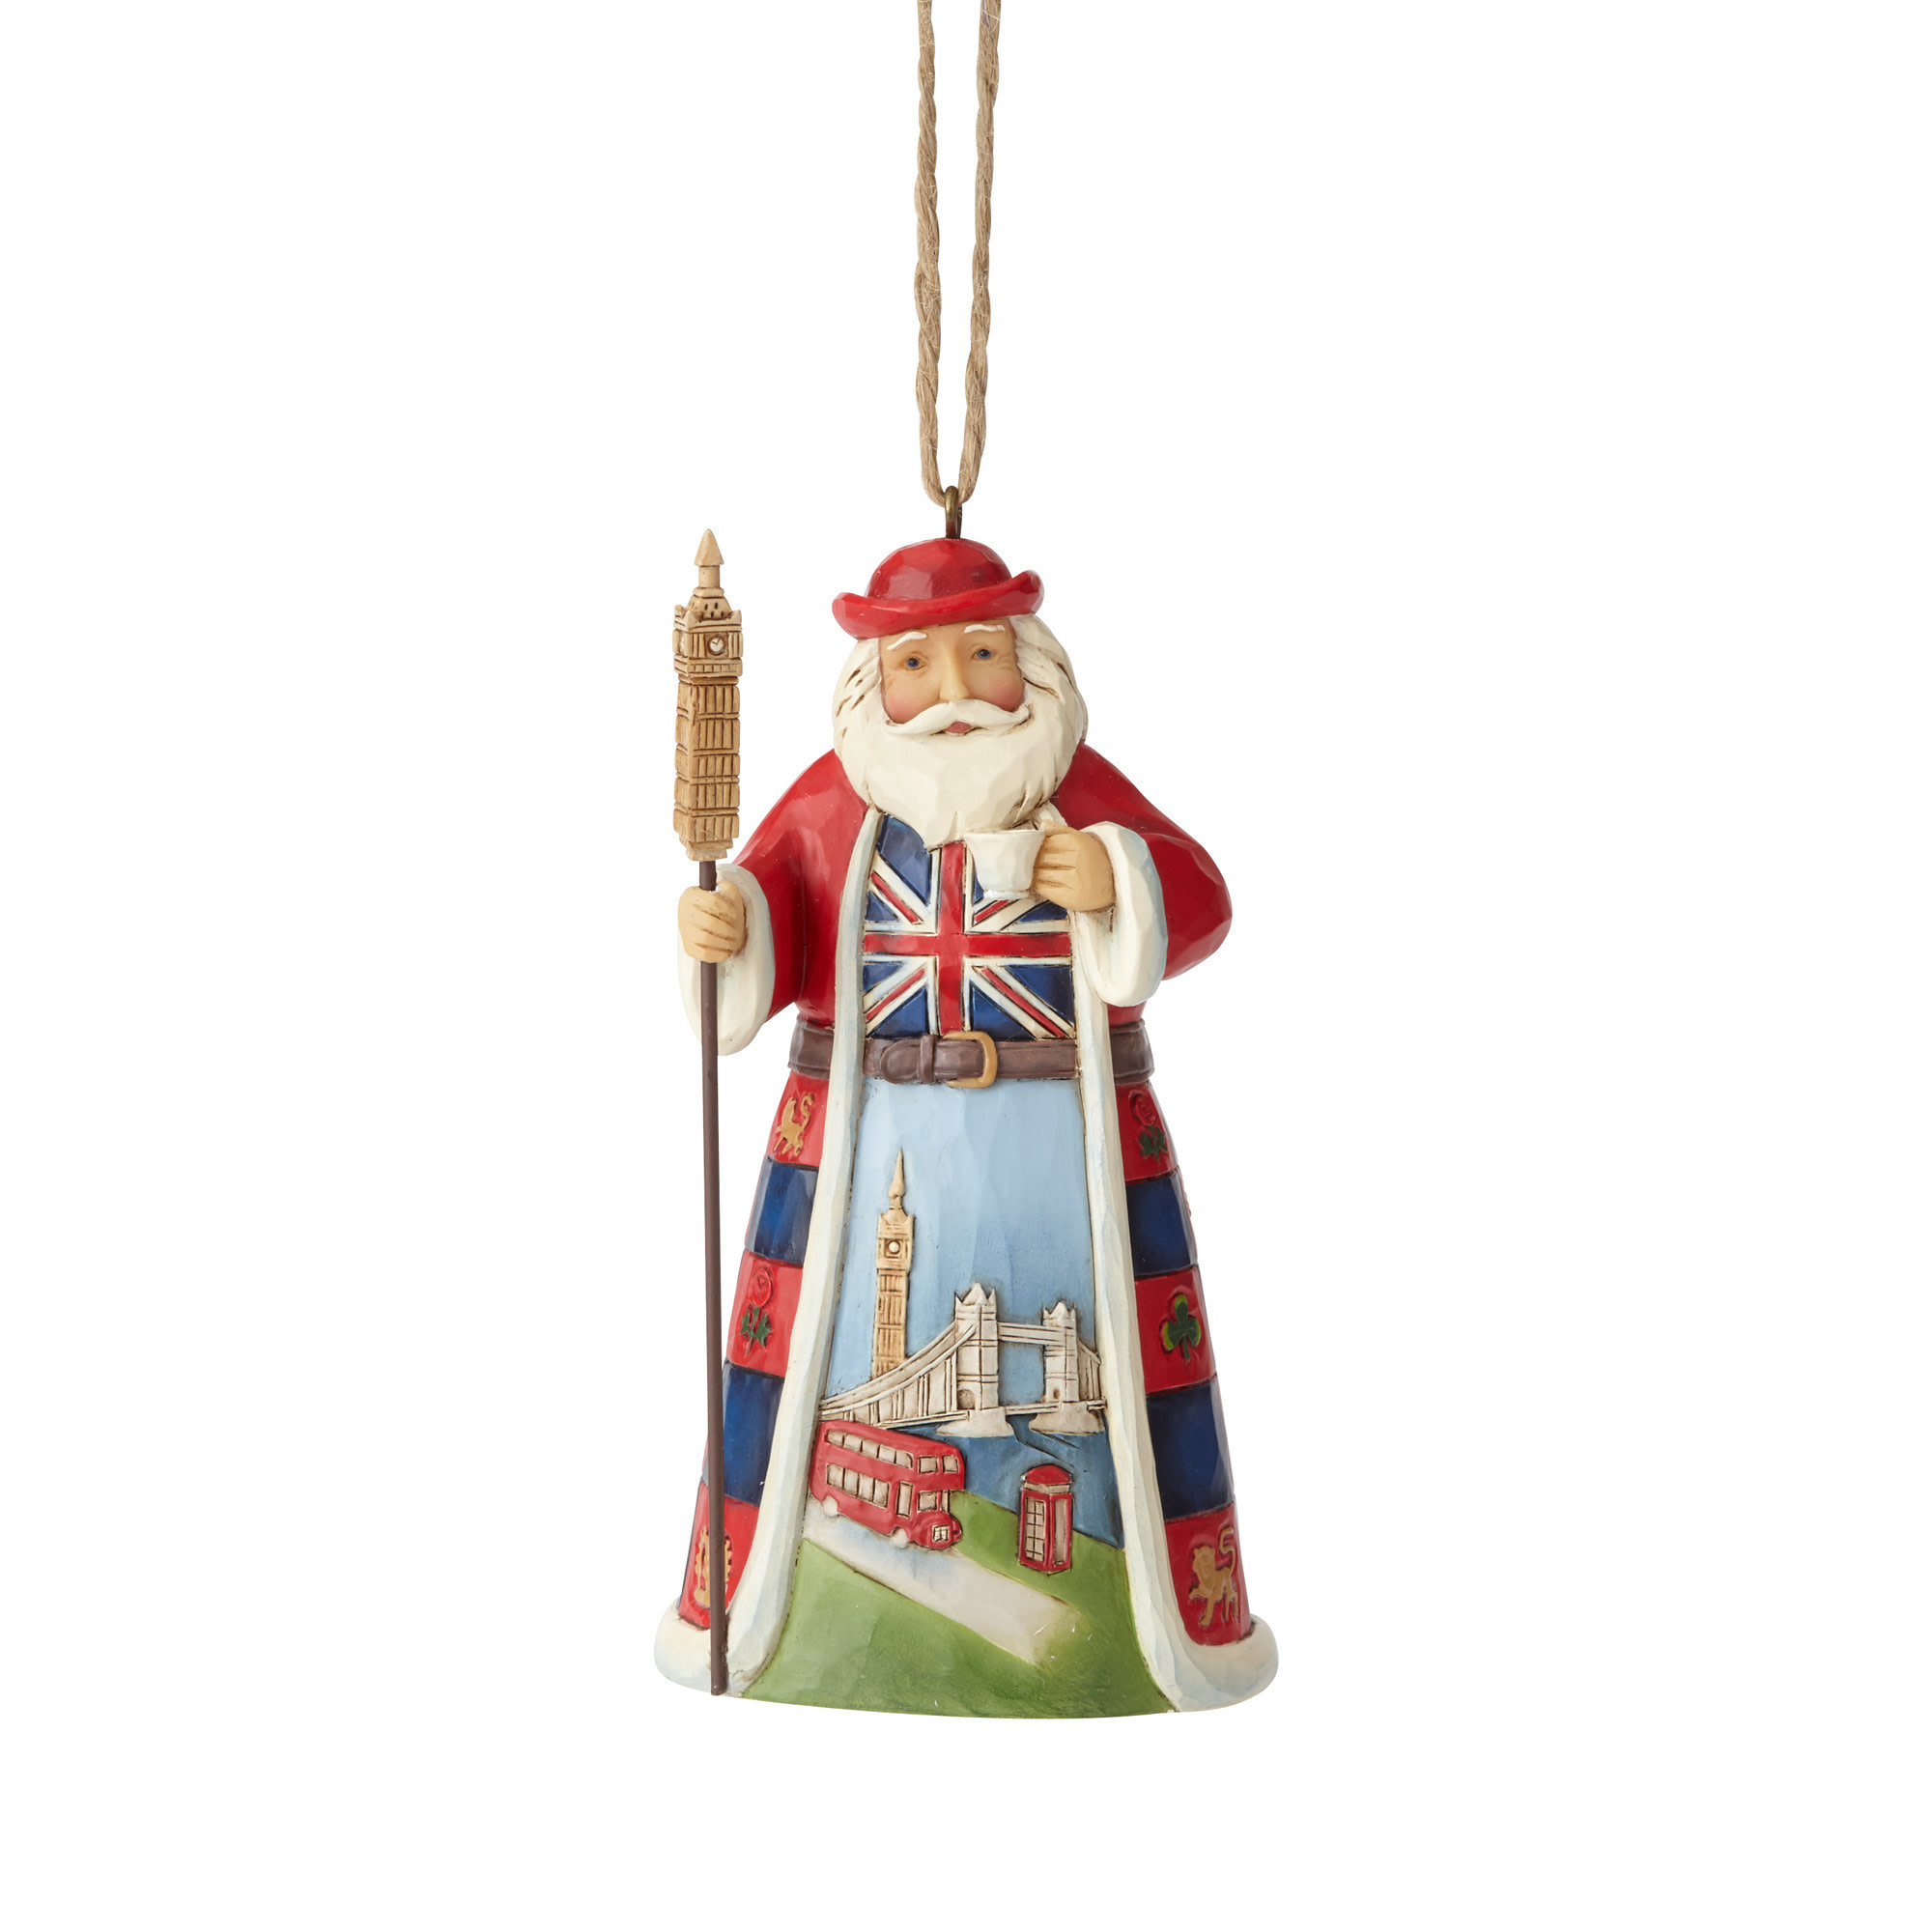 Jim Shore British Santa Ornament